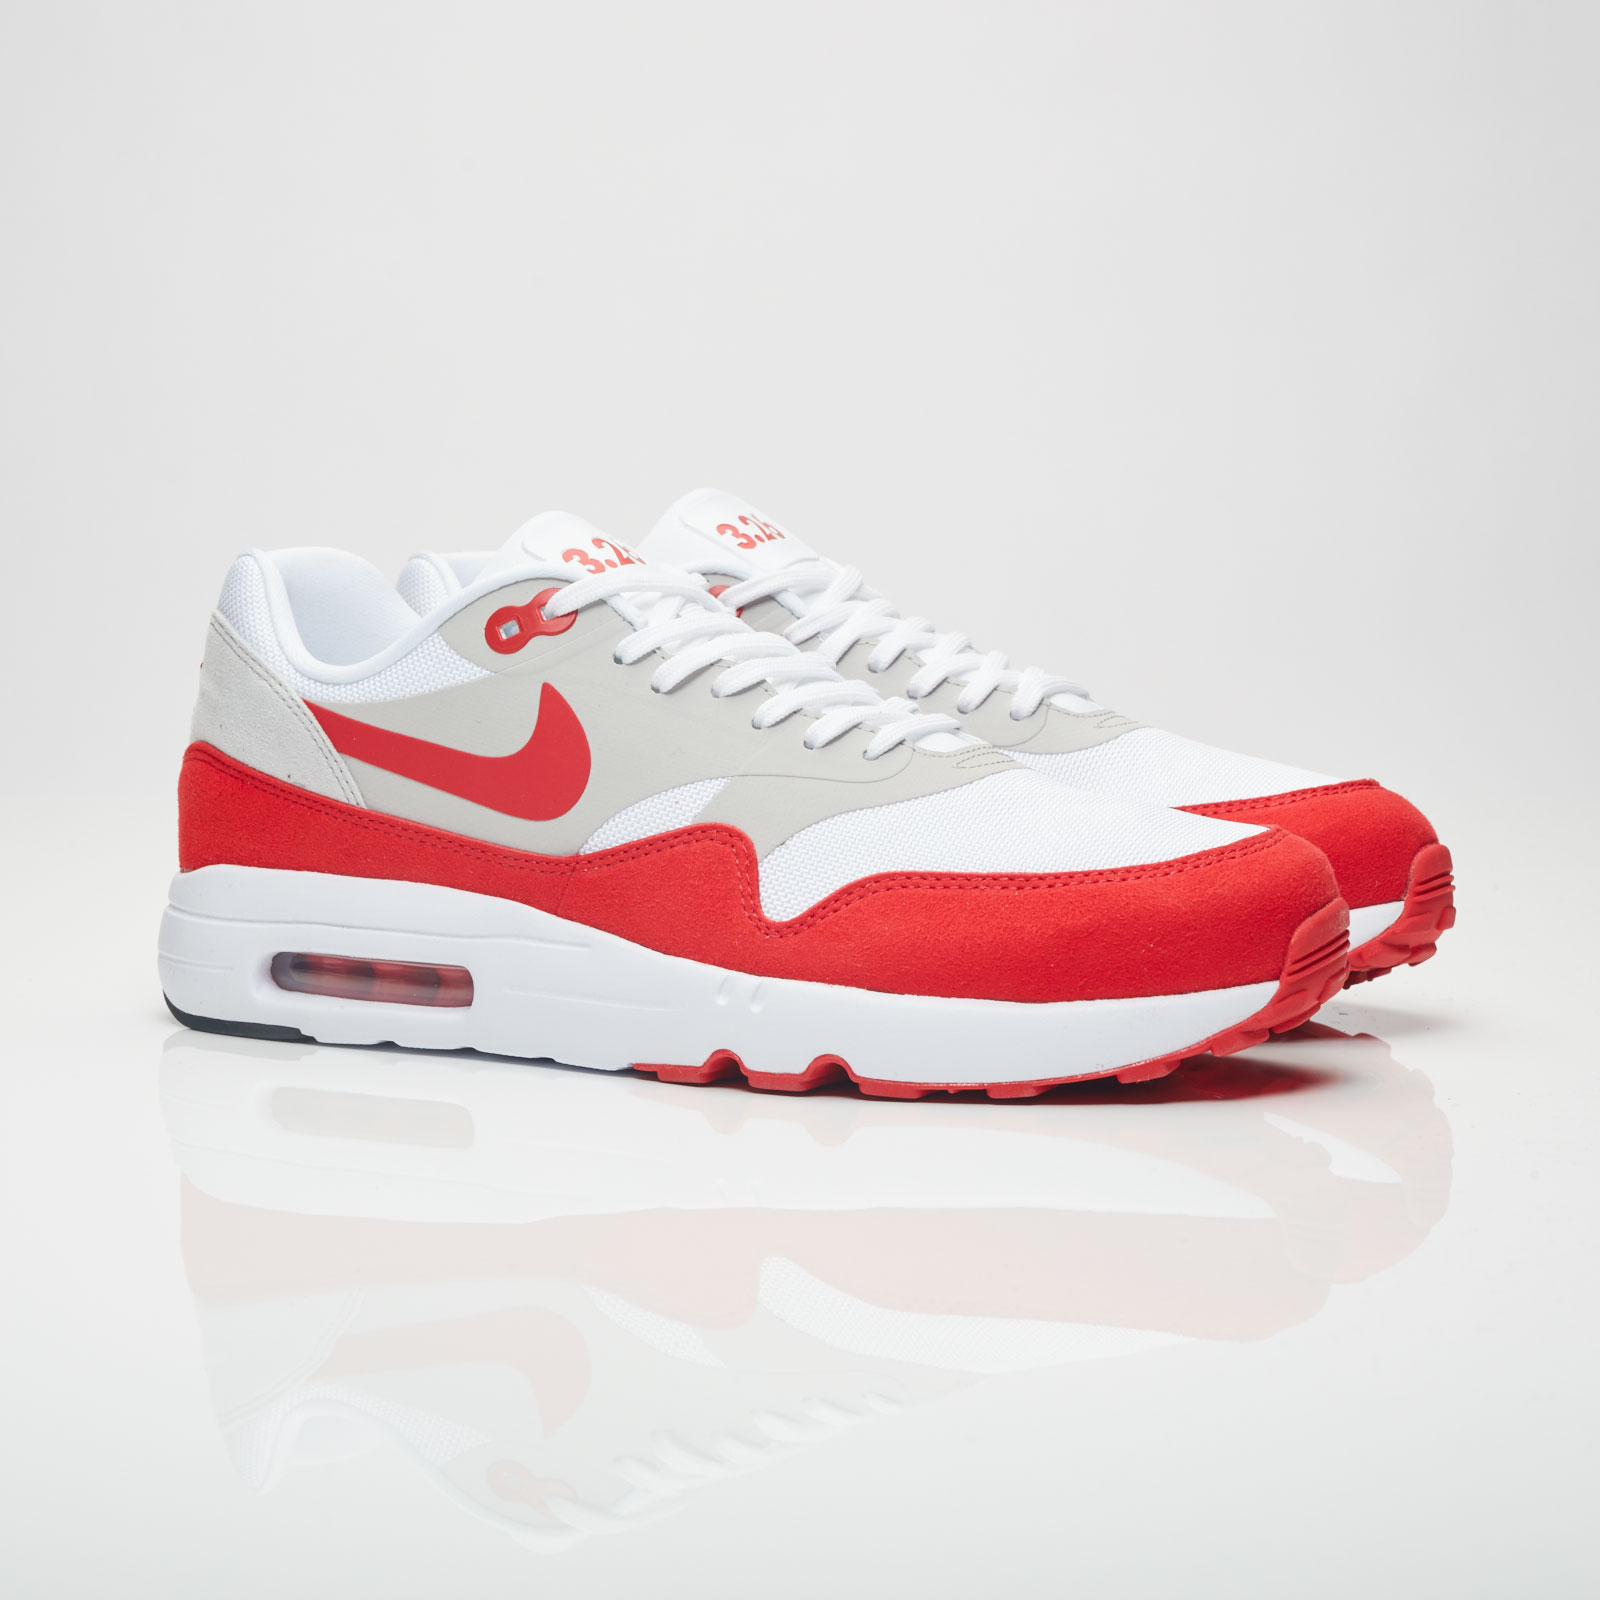 100% authentic 06f99 24c86 Nike Sportswear Air Max 1 Ultra 2.0 Le